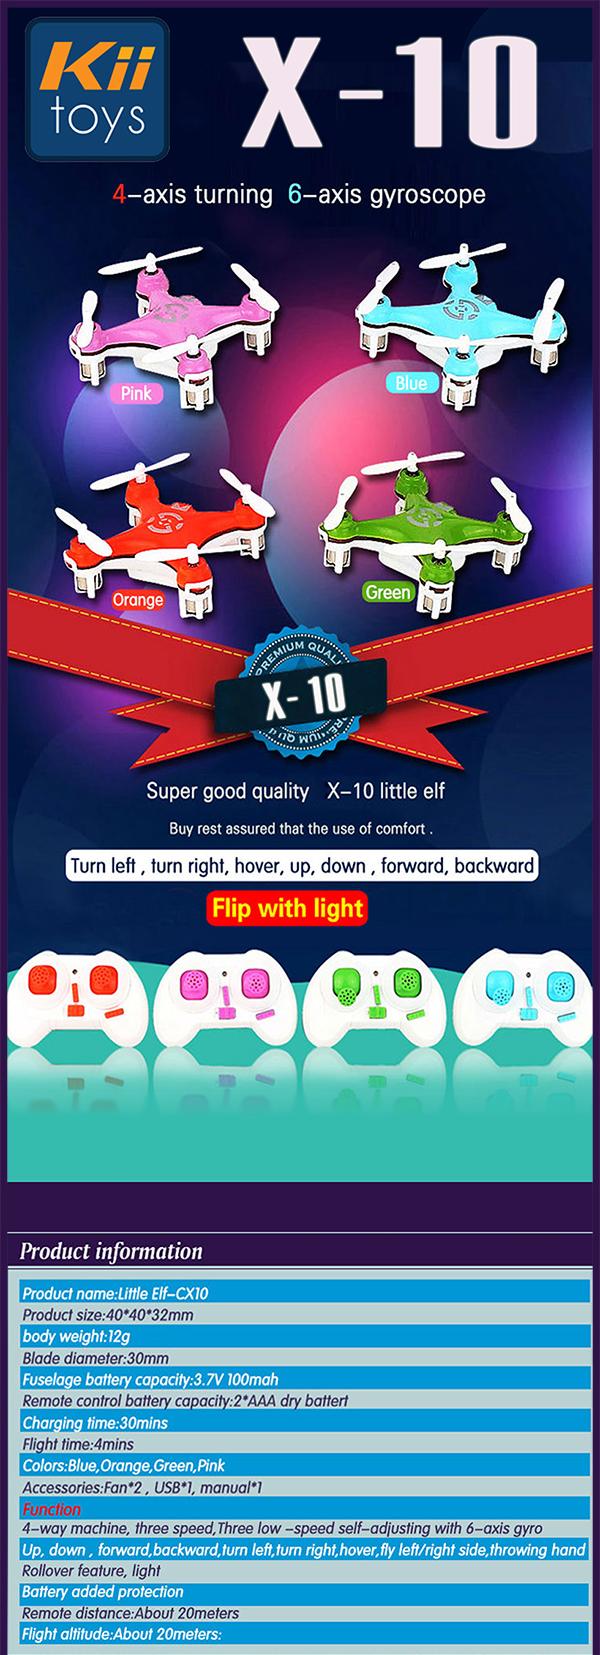 KiiToys - X-10 Quad Copters